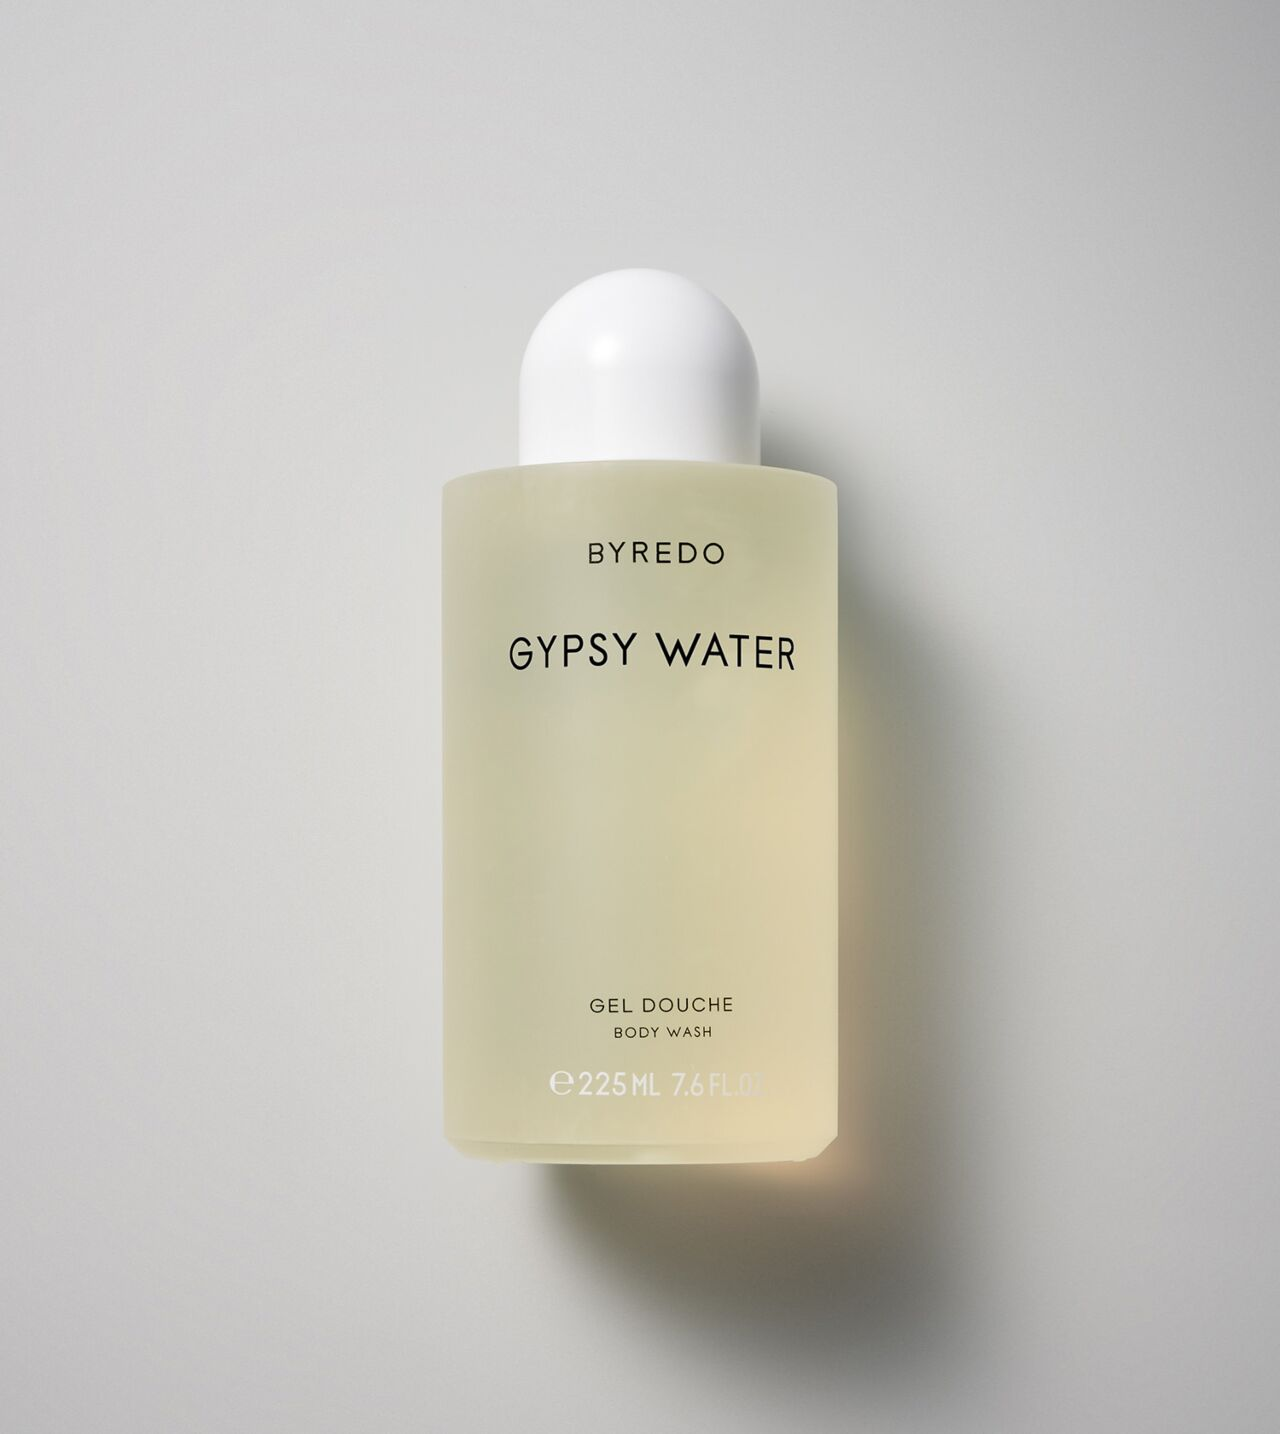 Picture of Byredo Gypsy Water Body wash 225ml